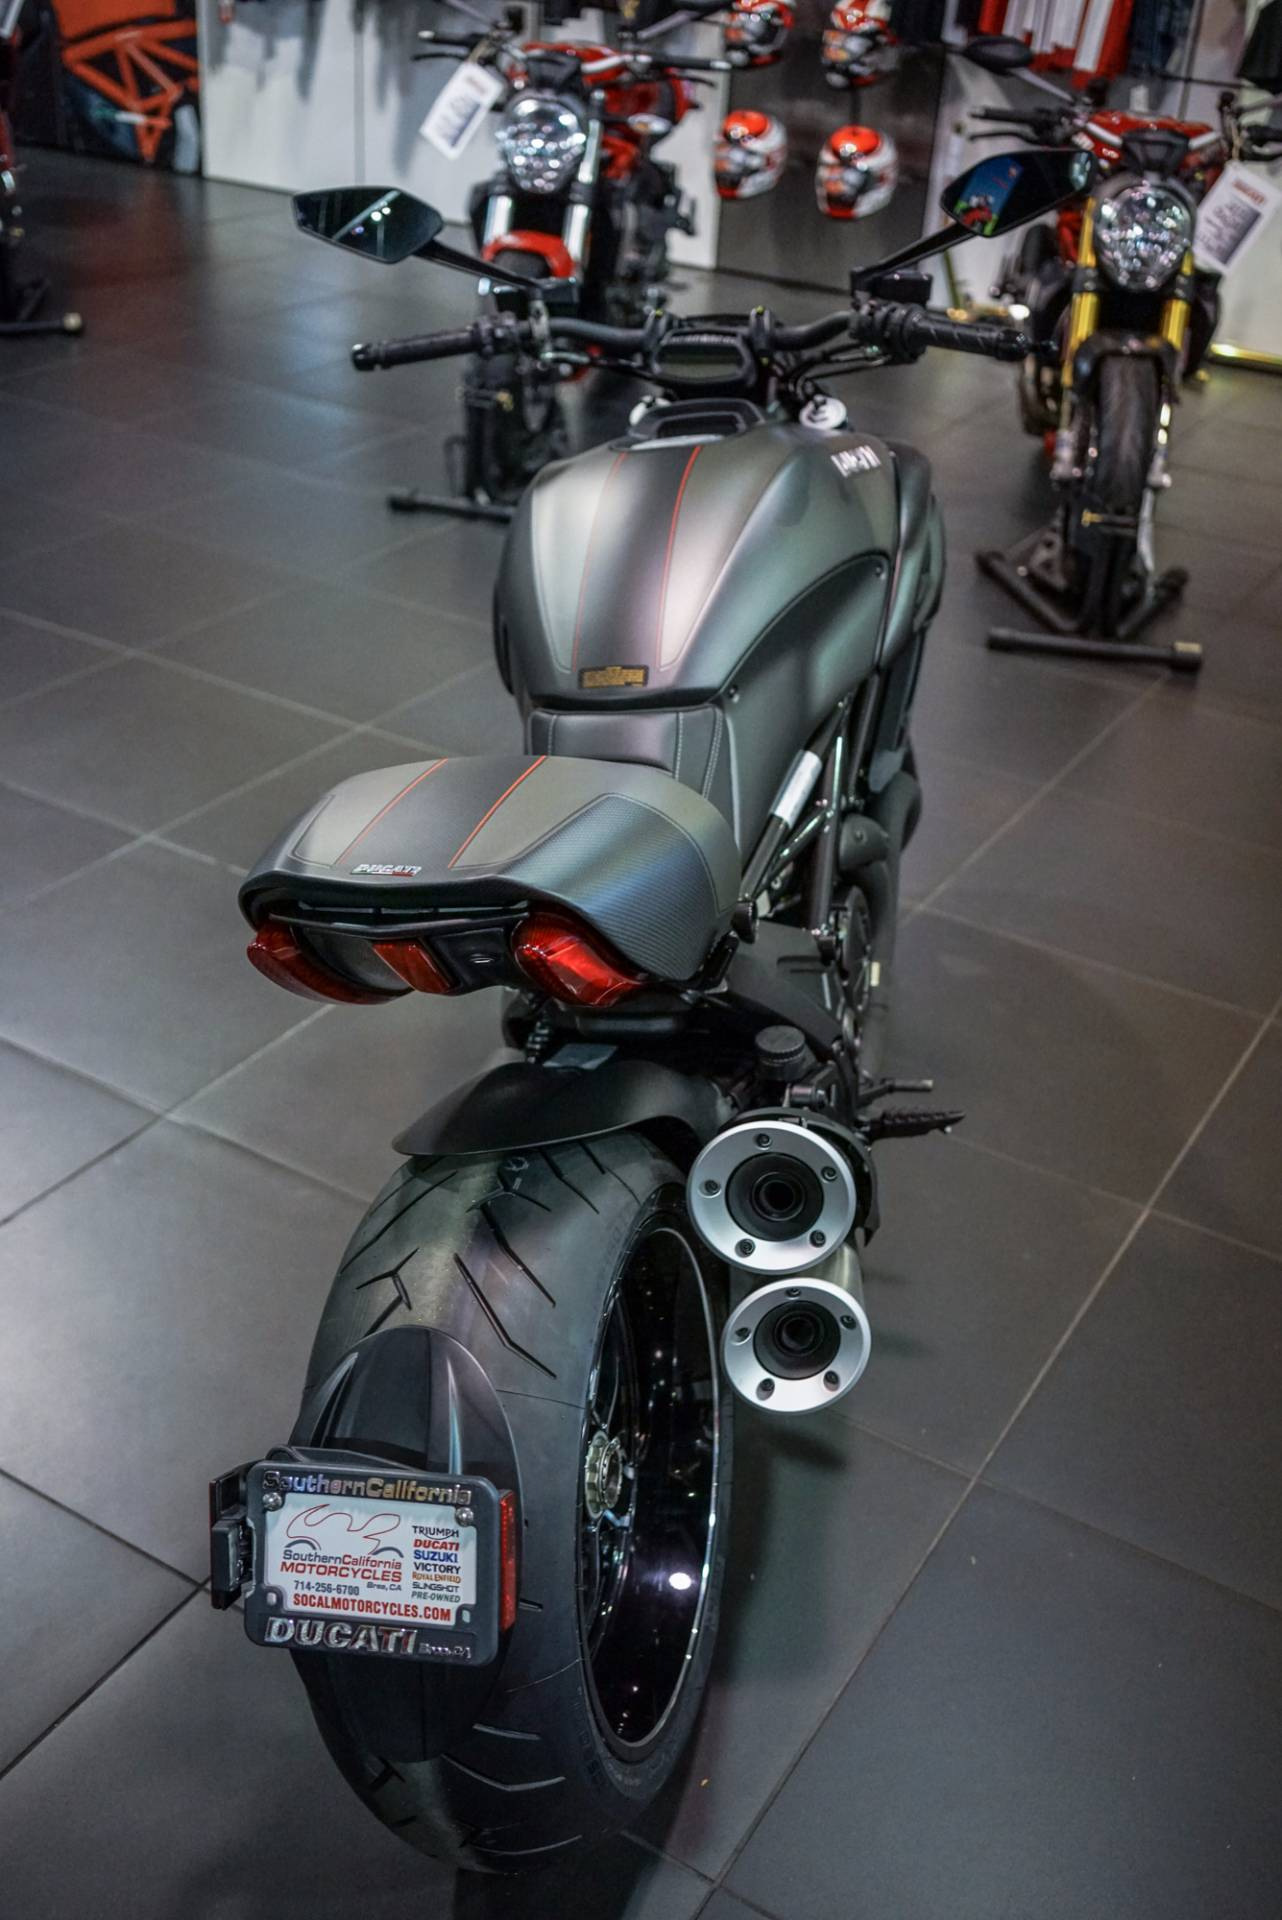 New 2018 Ducati Diavel Carbon Motorcycles in Brea, CA